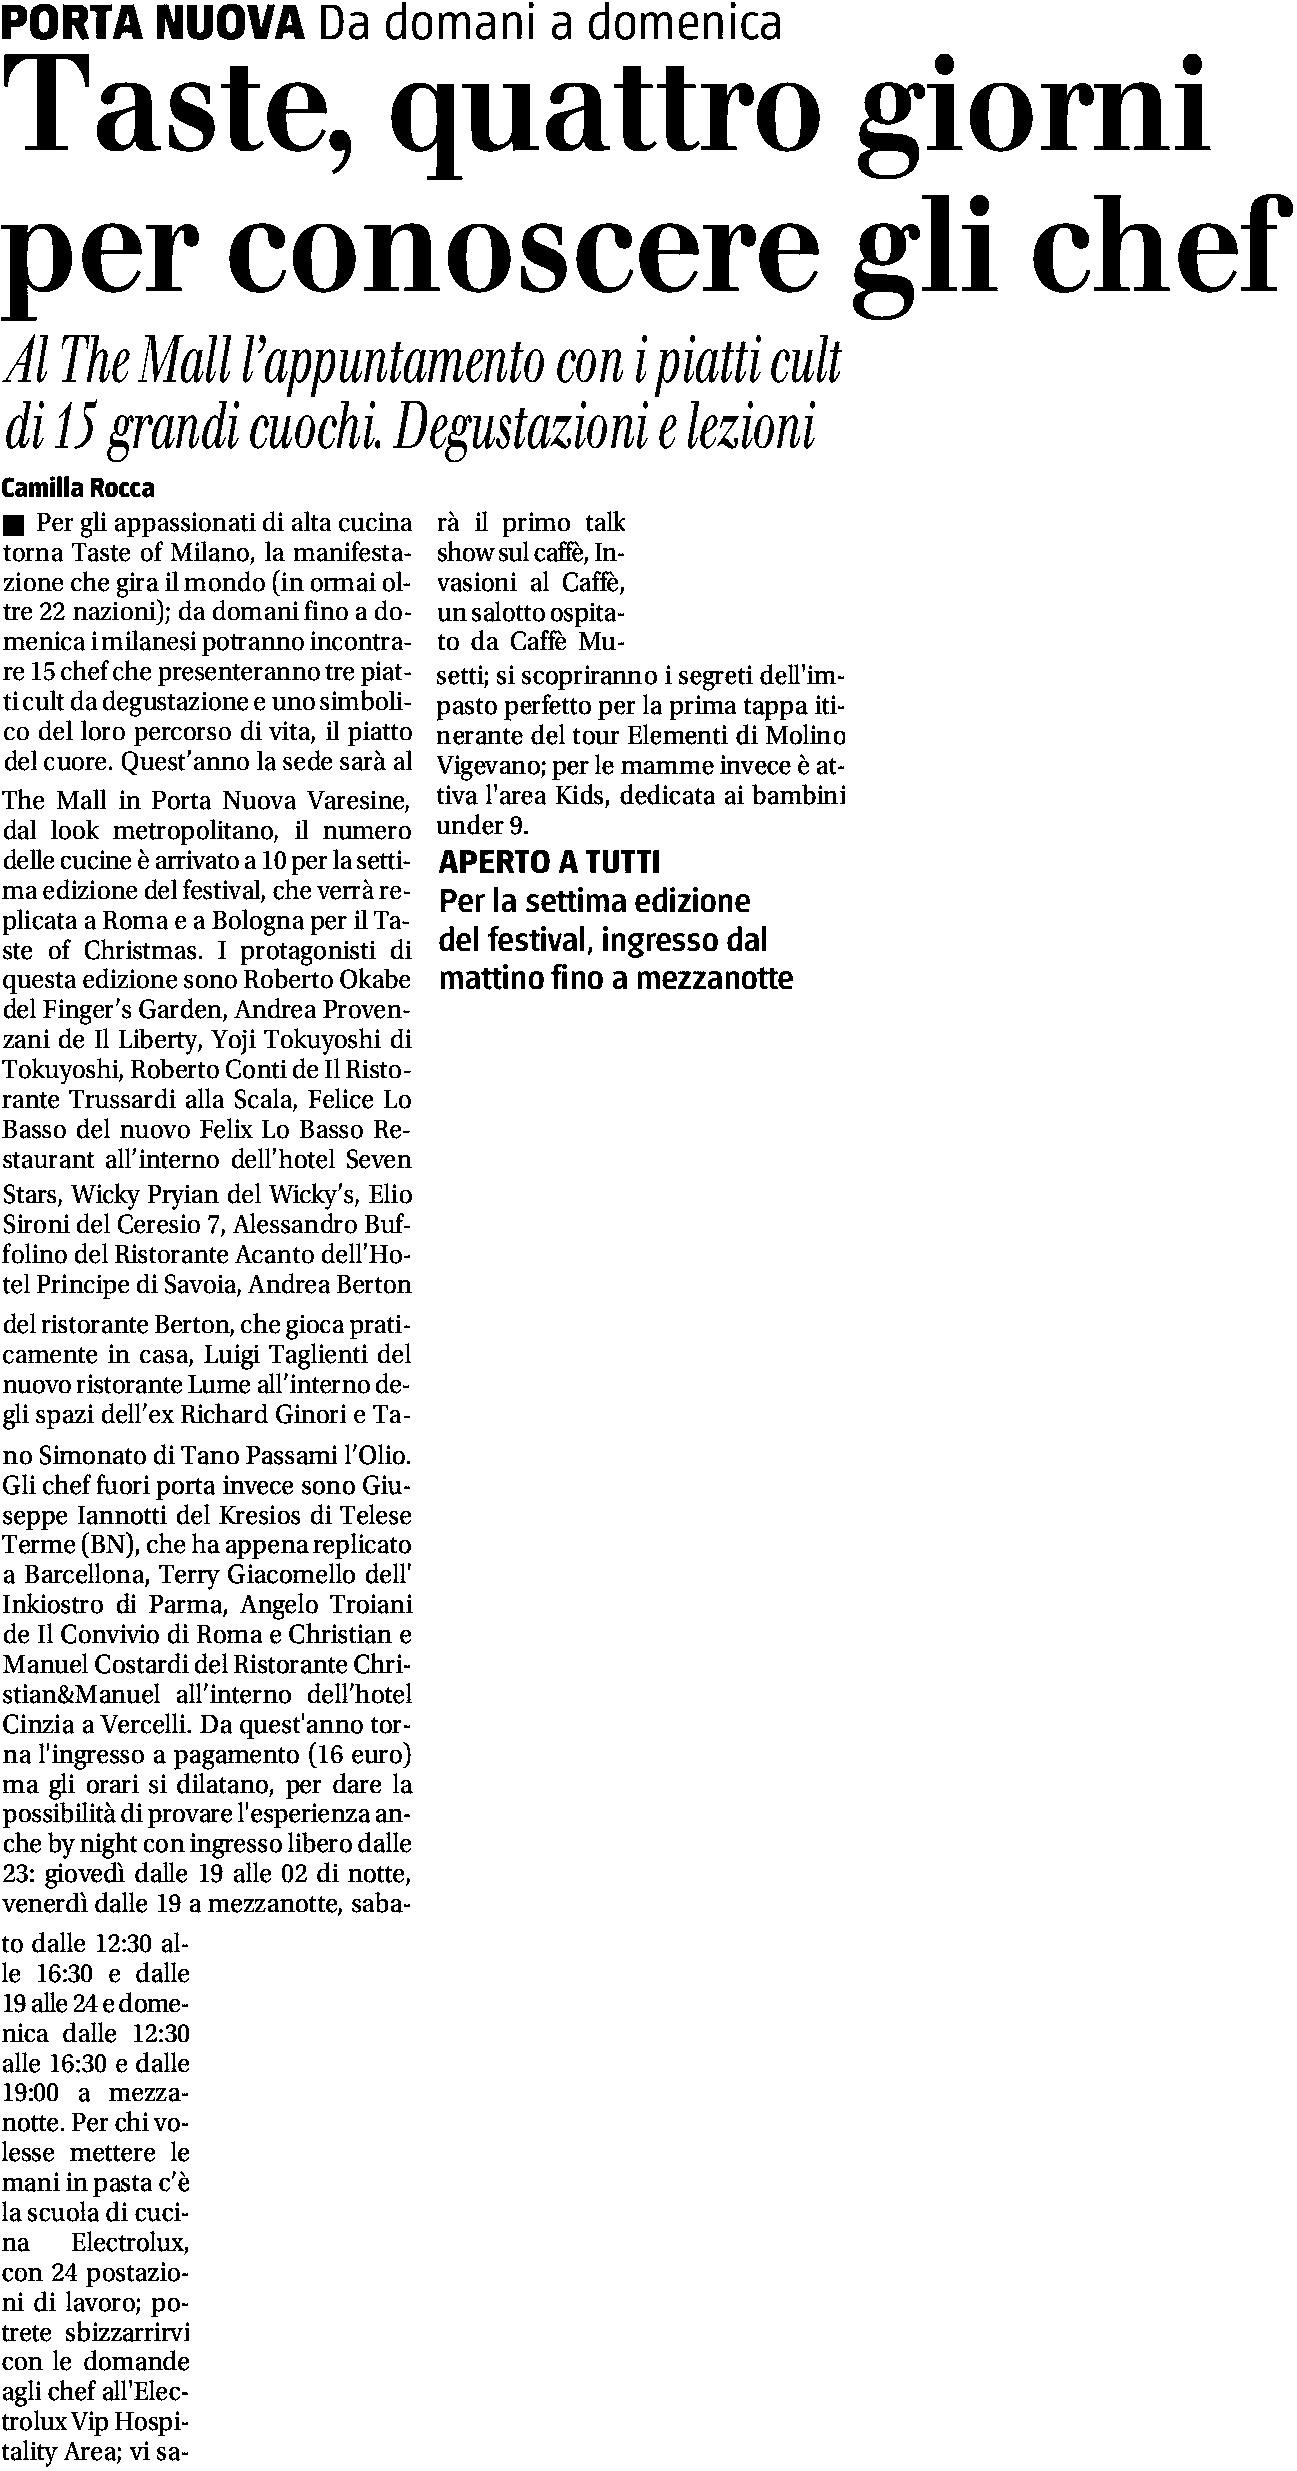 18.05.16_ilgiornalemilano